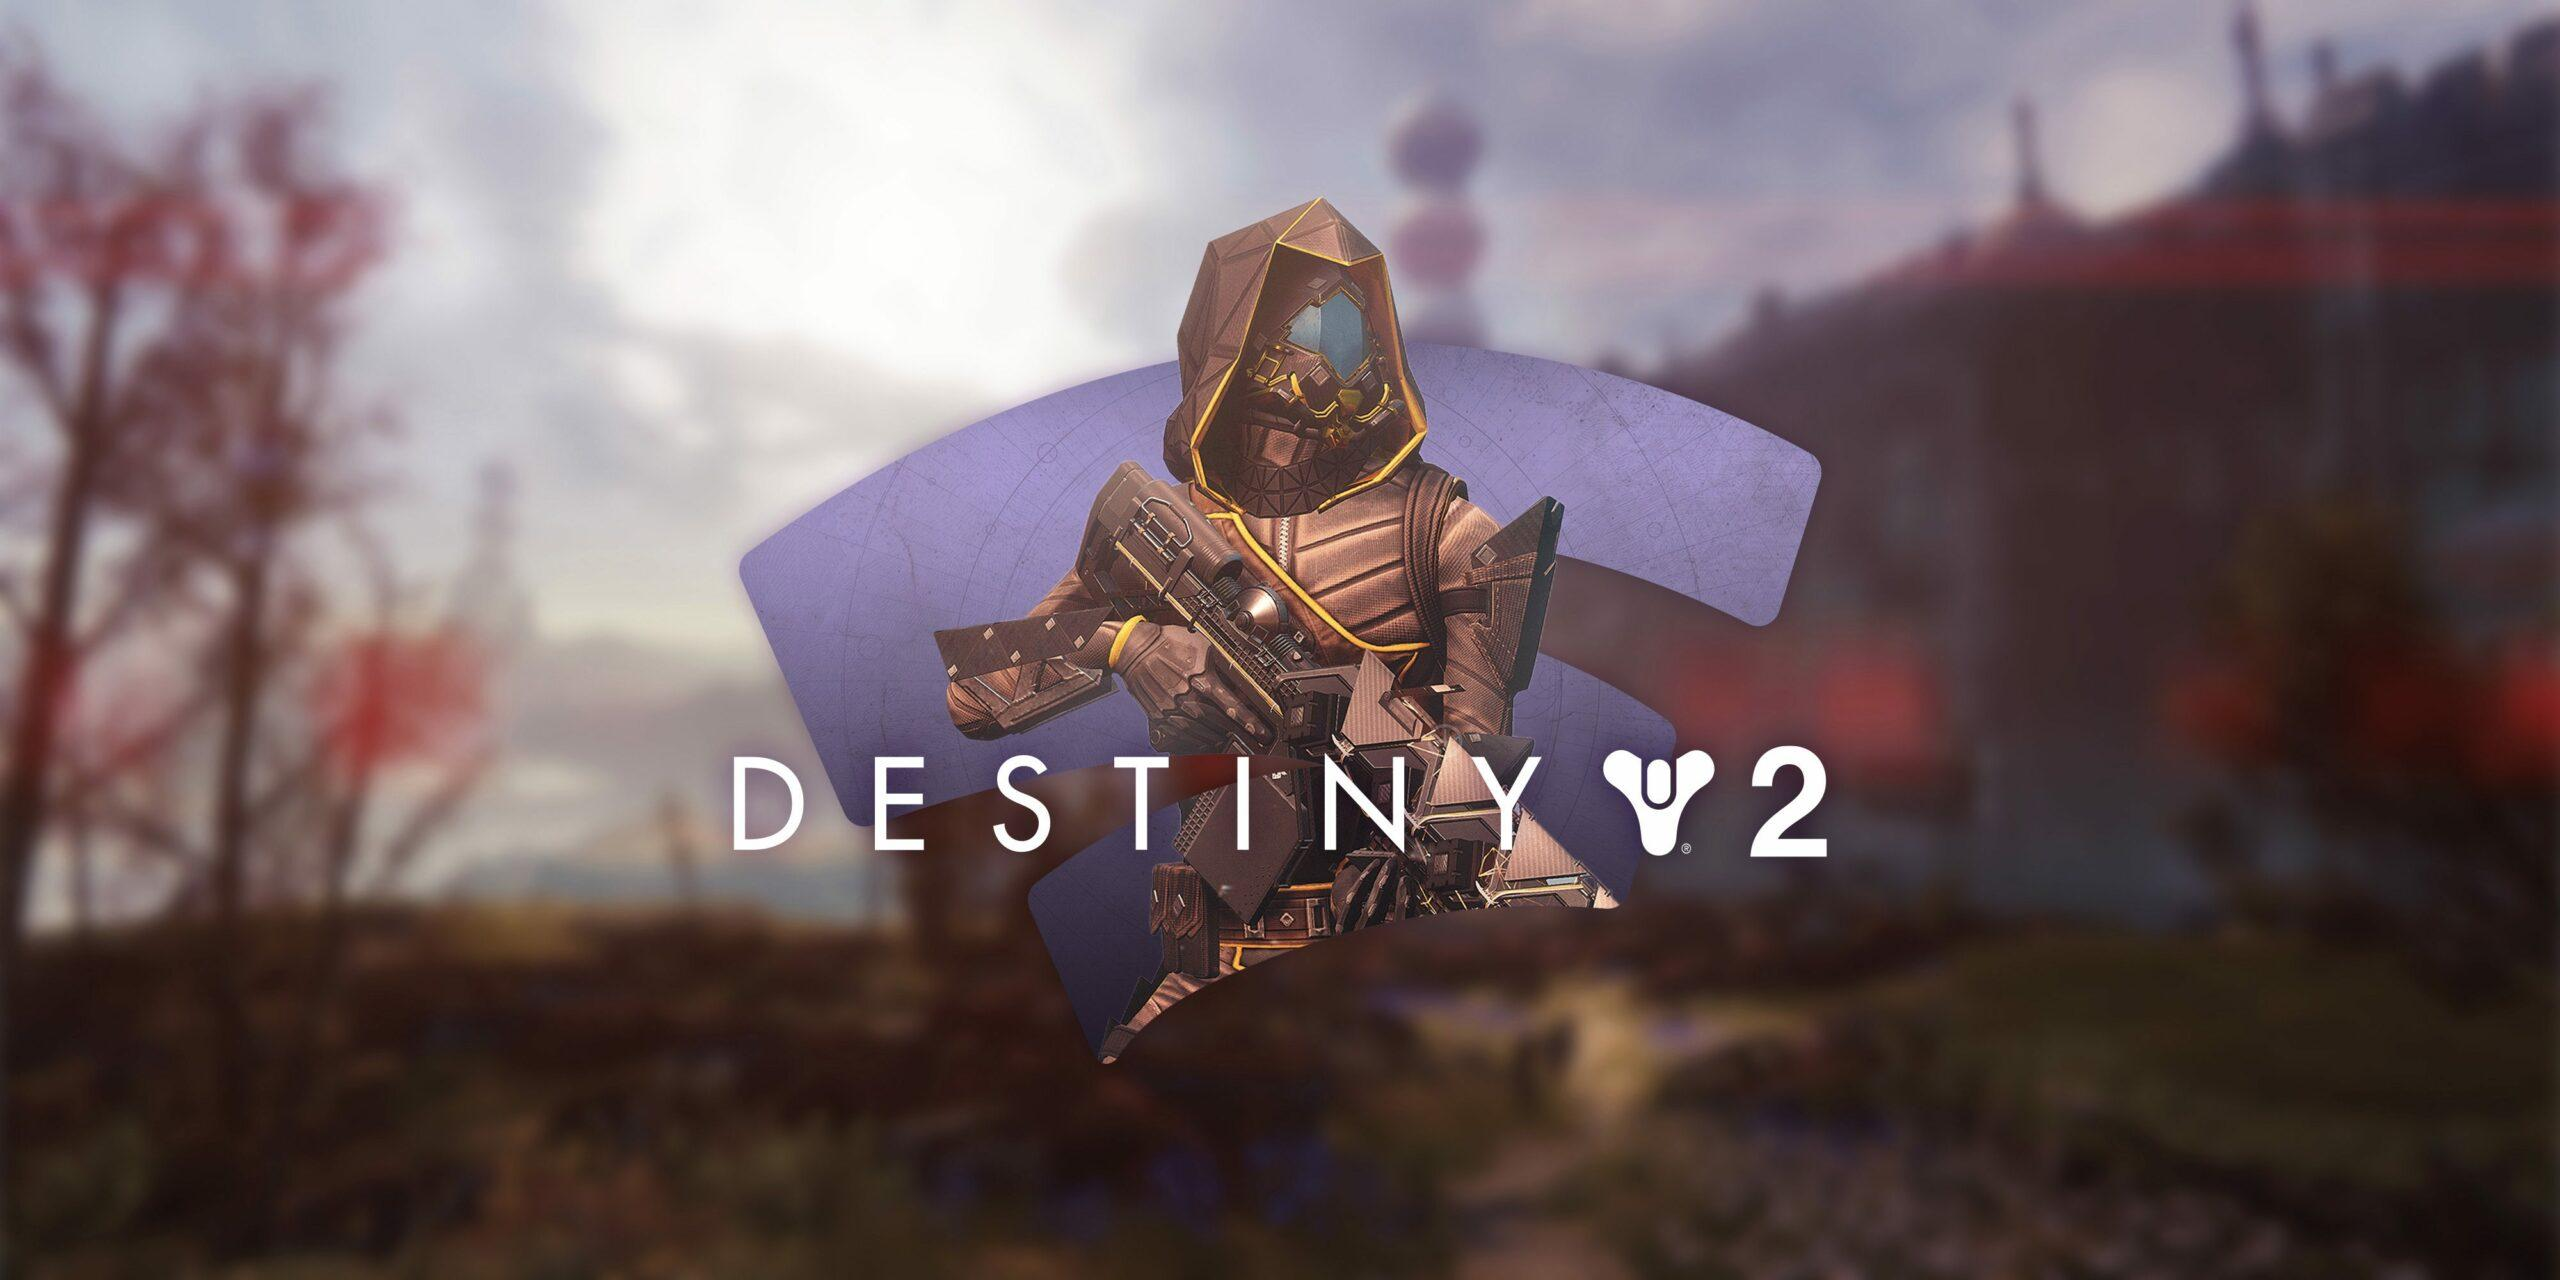 Destiny 2 eighth Penguin location